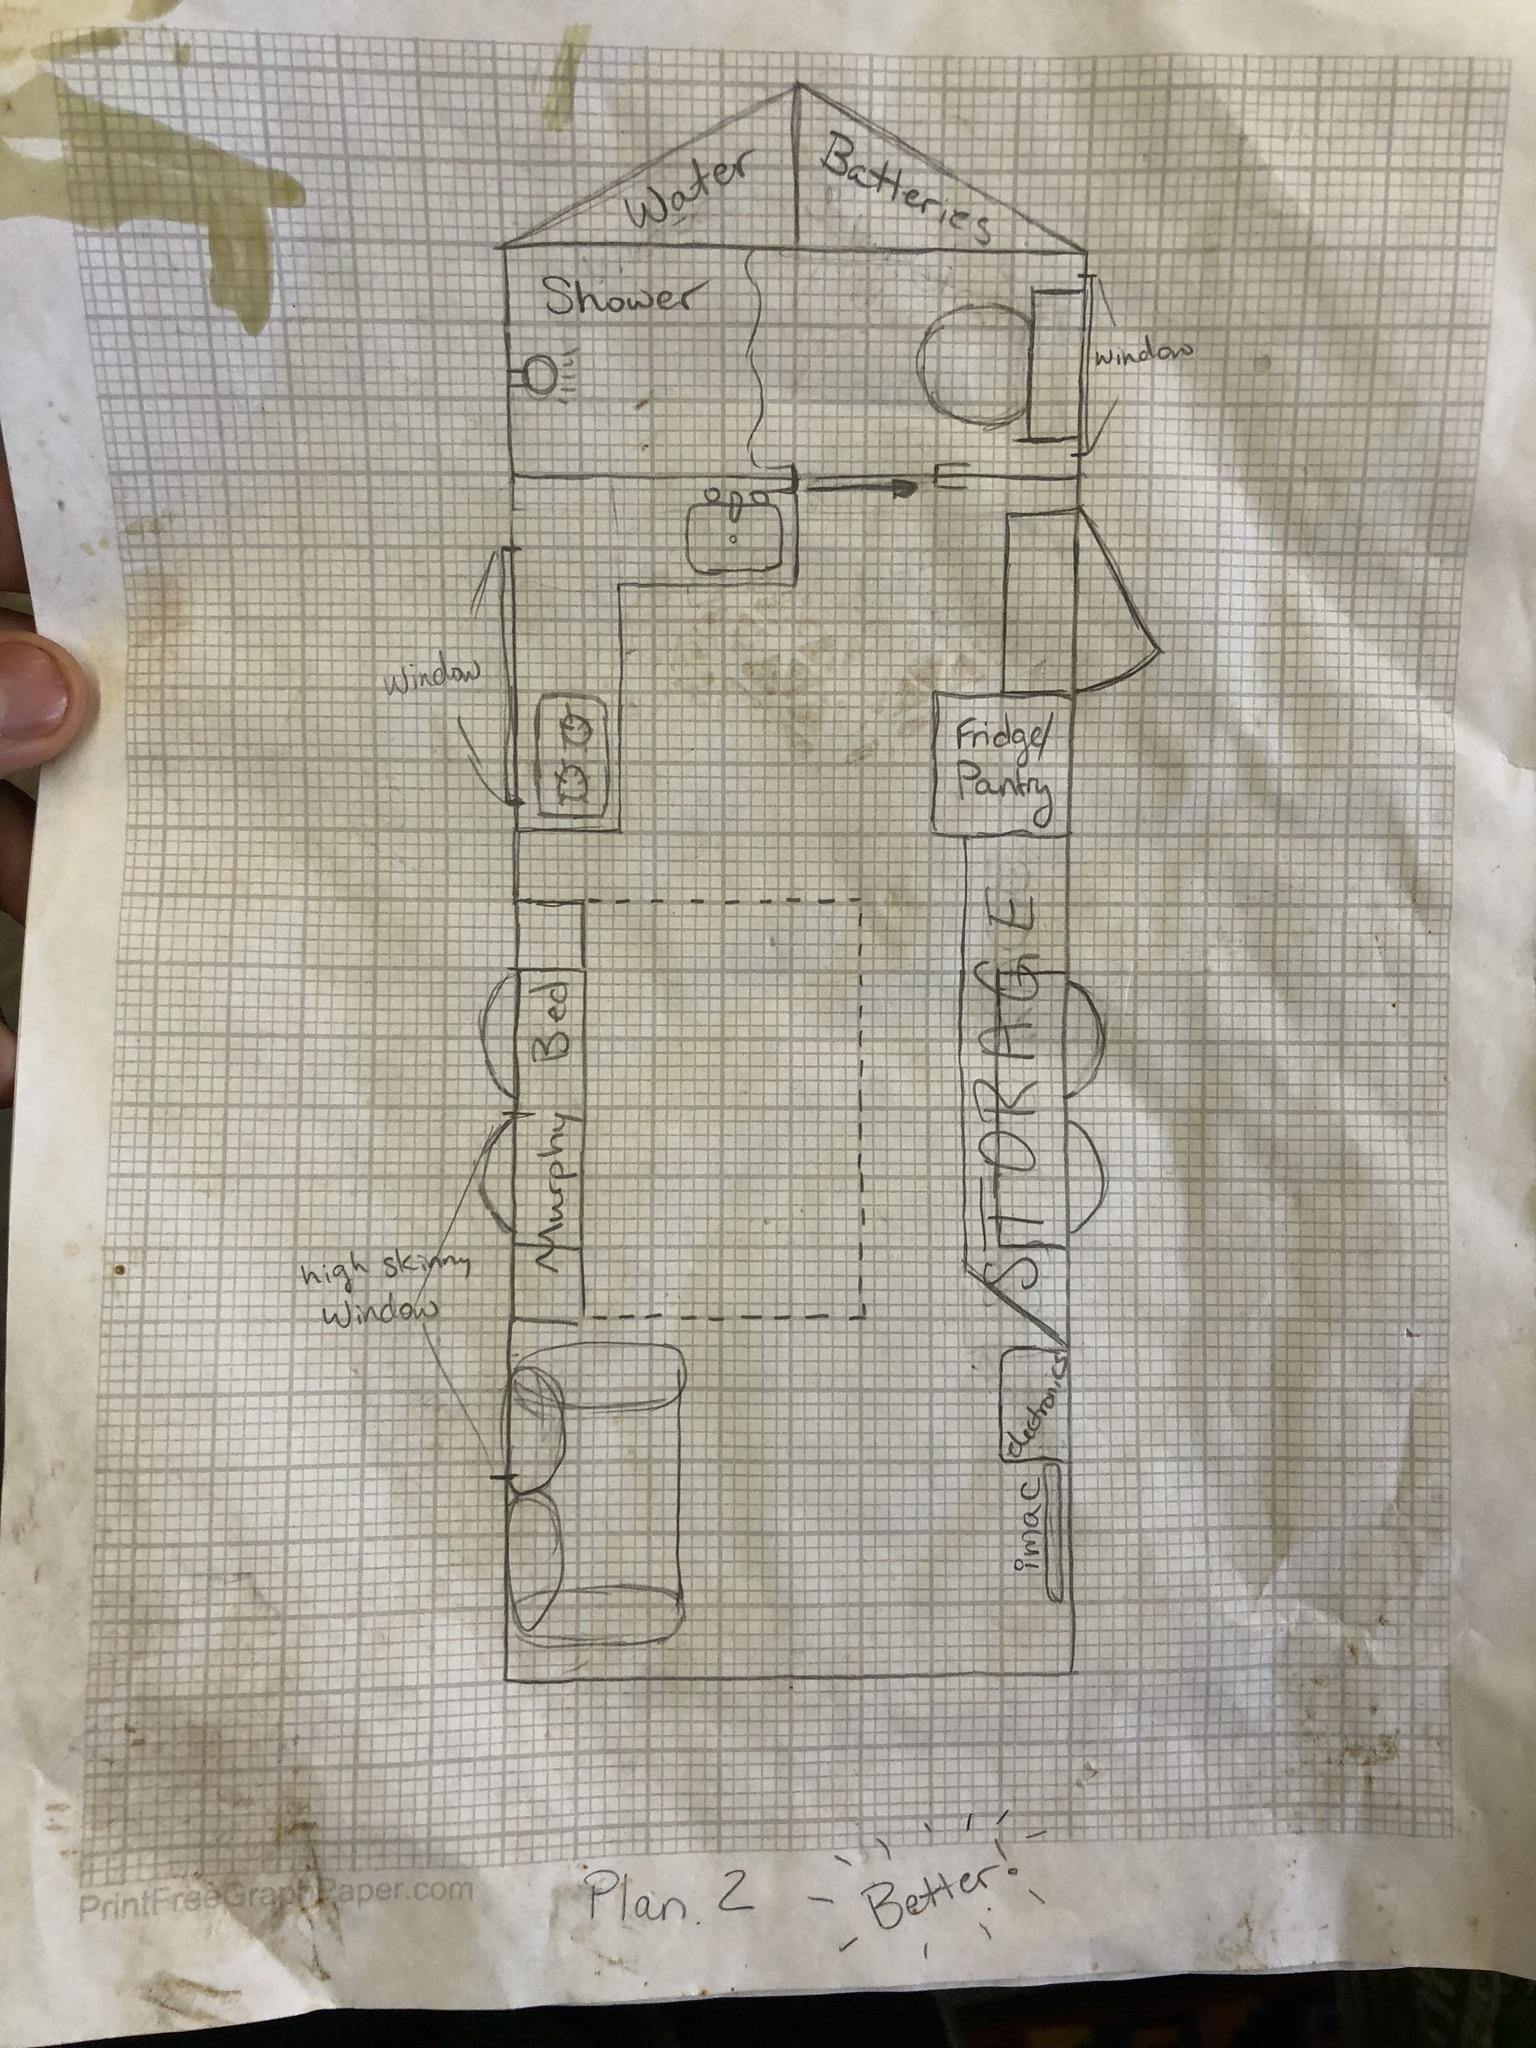 Tiny Plans - Version 2